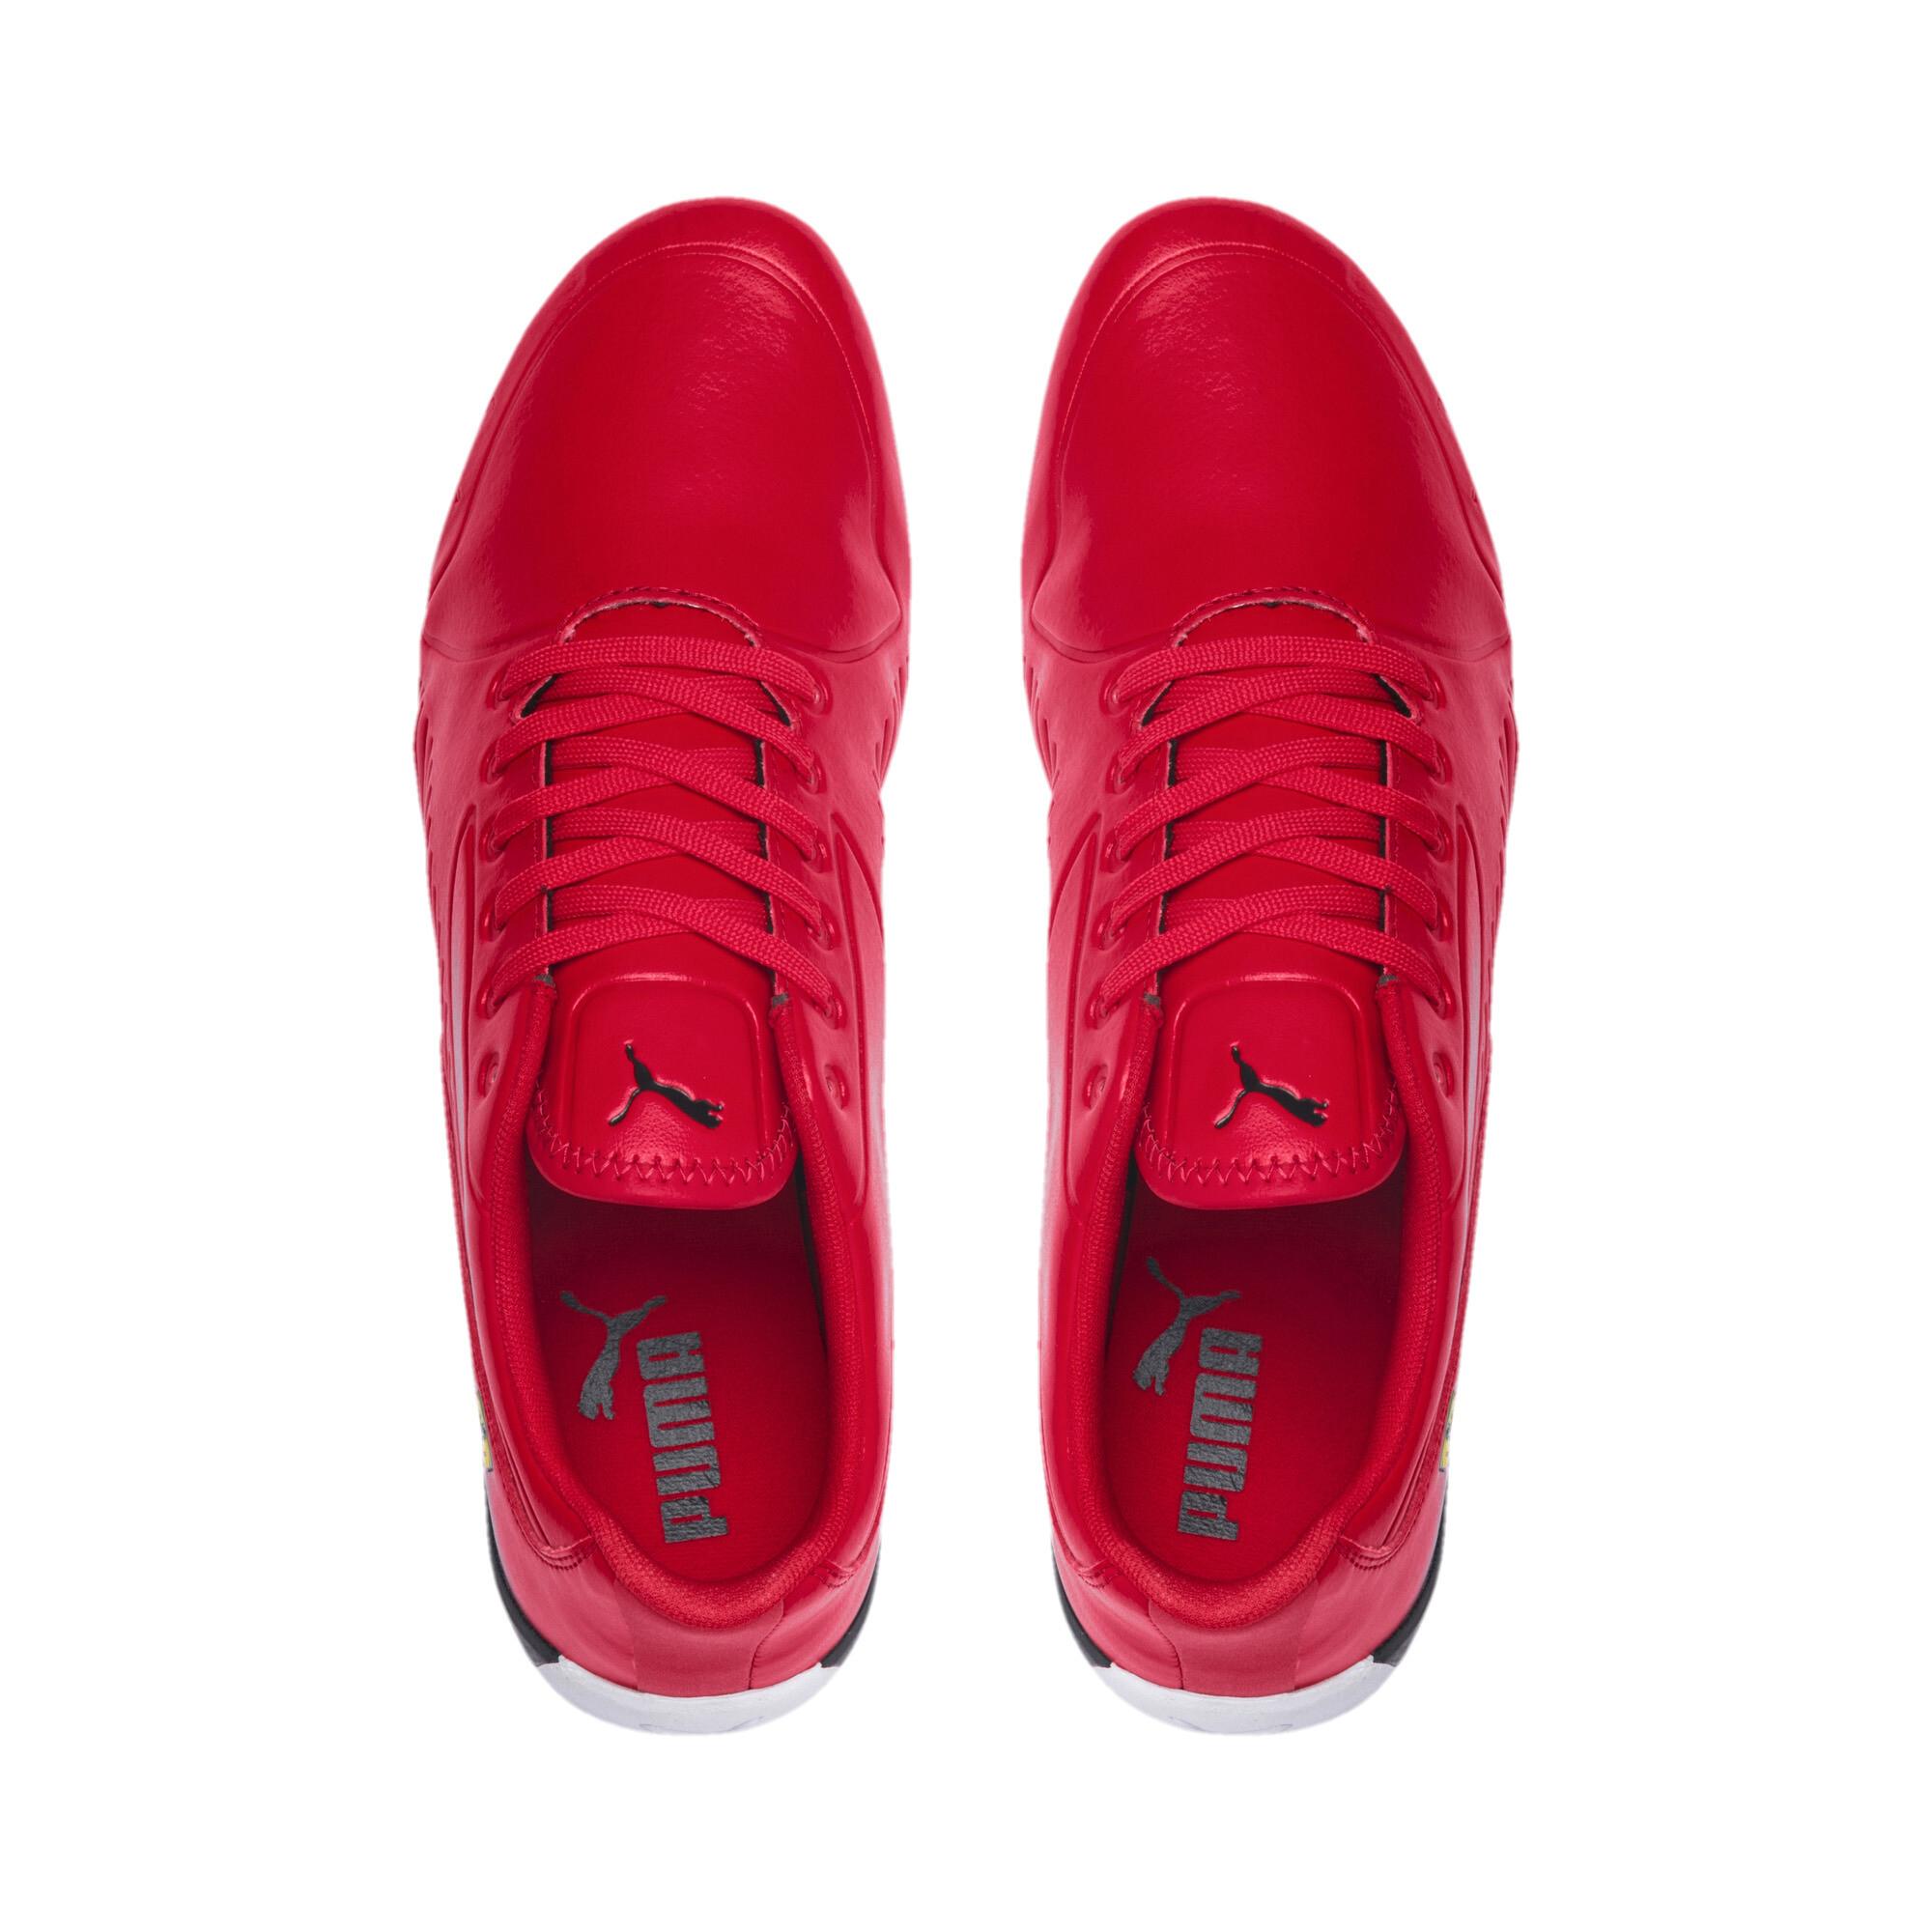 PUMA-Scuderia-Ferrari-Drift-Cat-7S-Ultra-Men-039-s-Shoes-Men-Shoe-Auto thumbnail 13